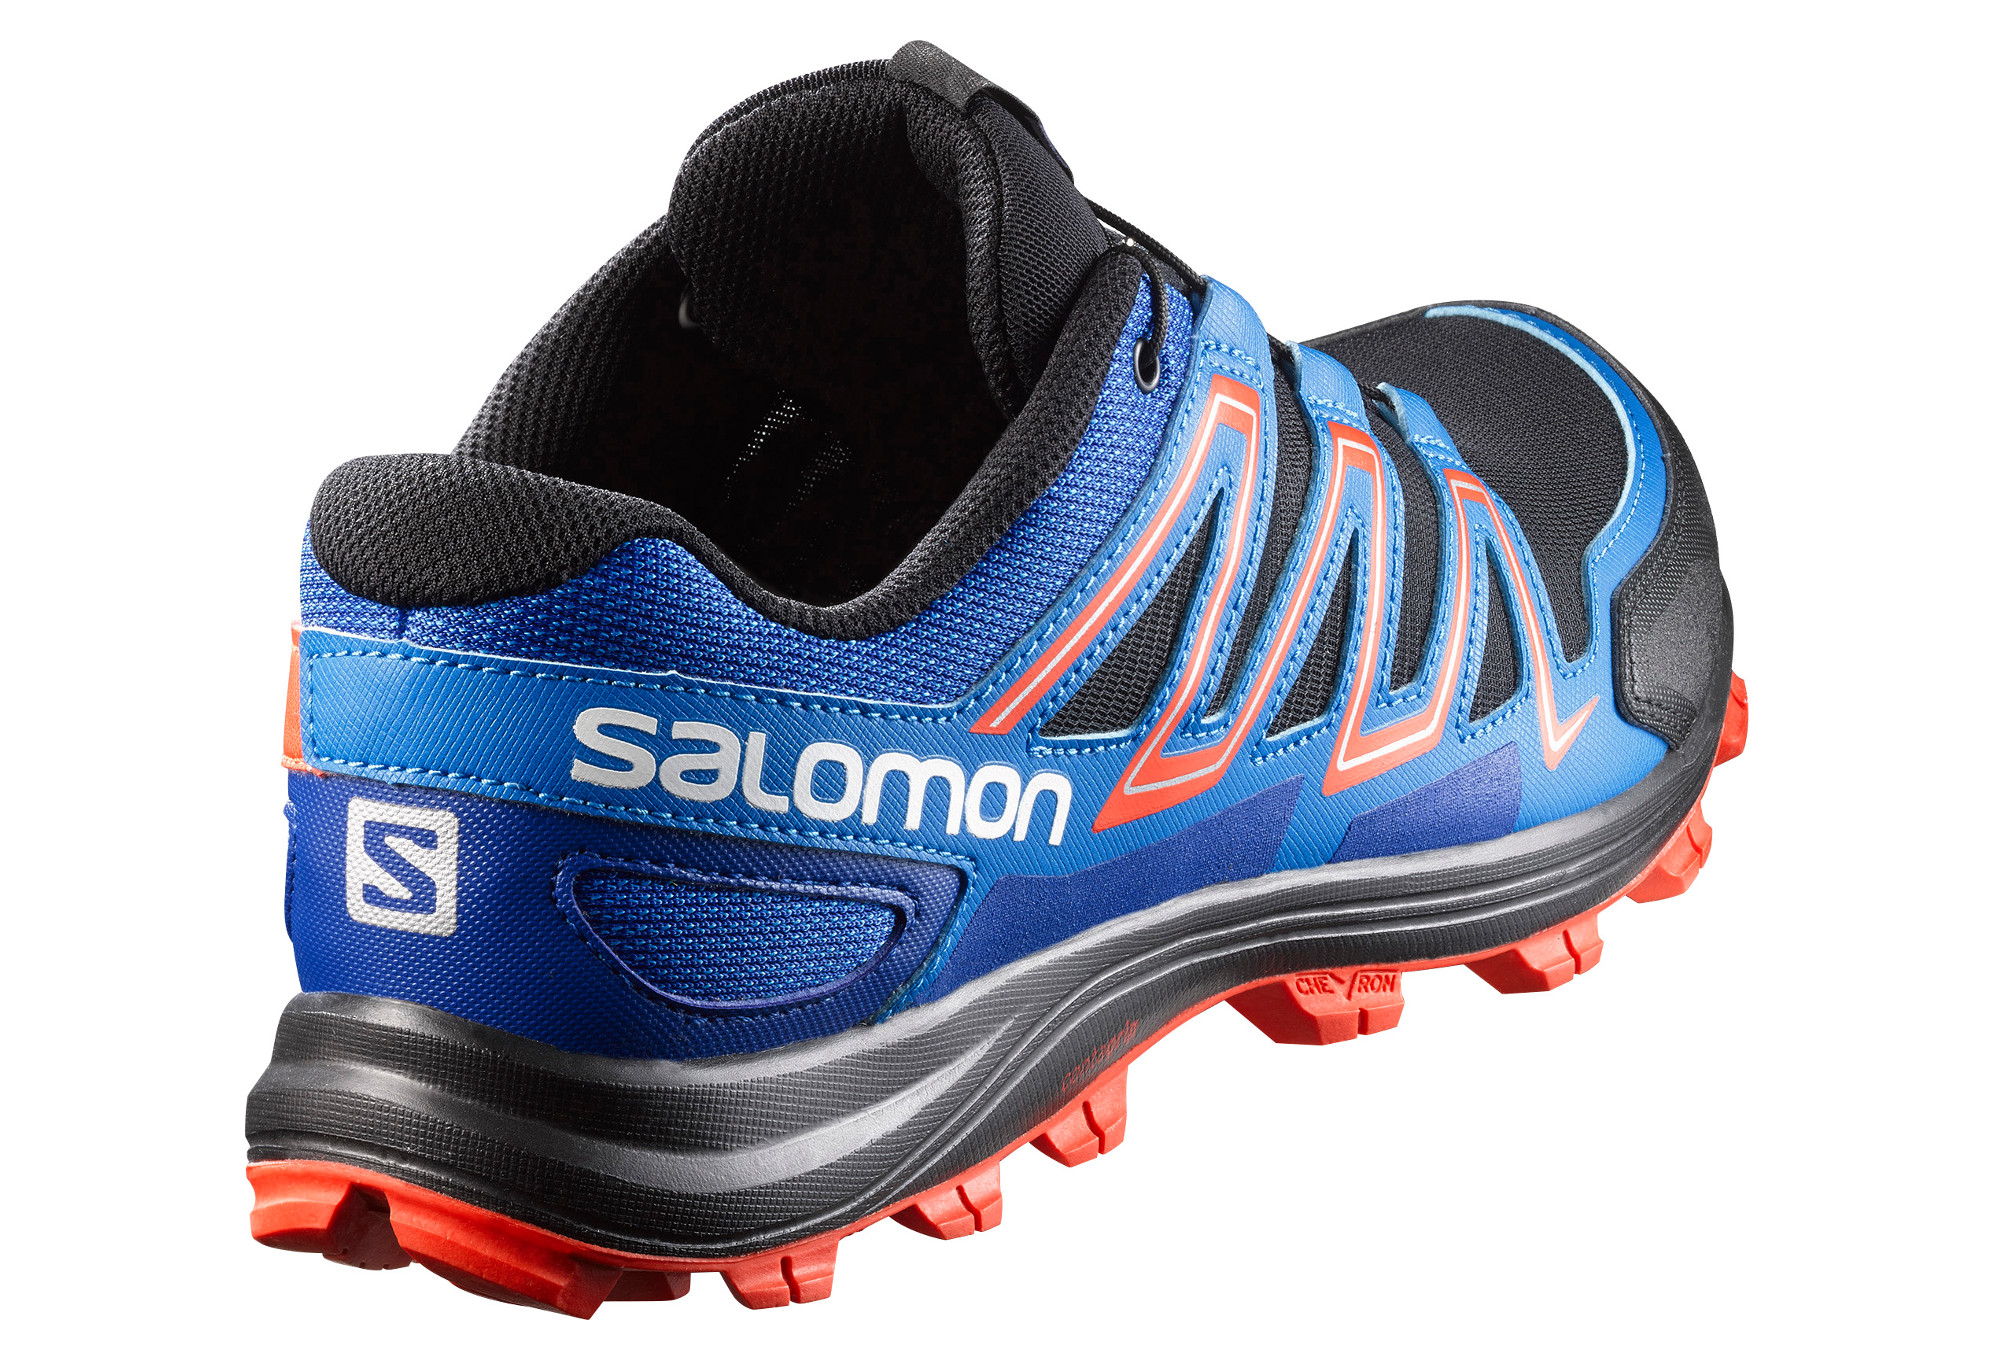 SALOMON SPEEDSTRAK Women's Shoes Blue Grey